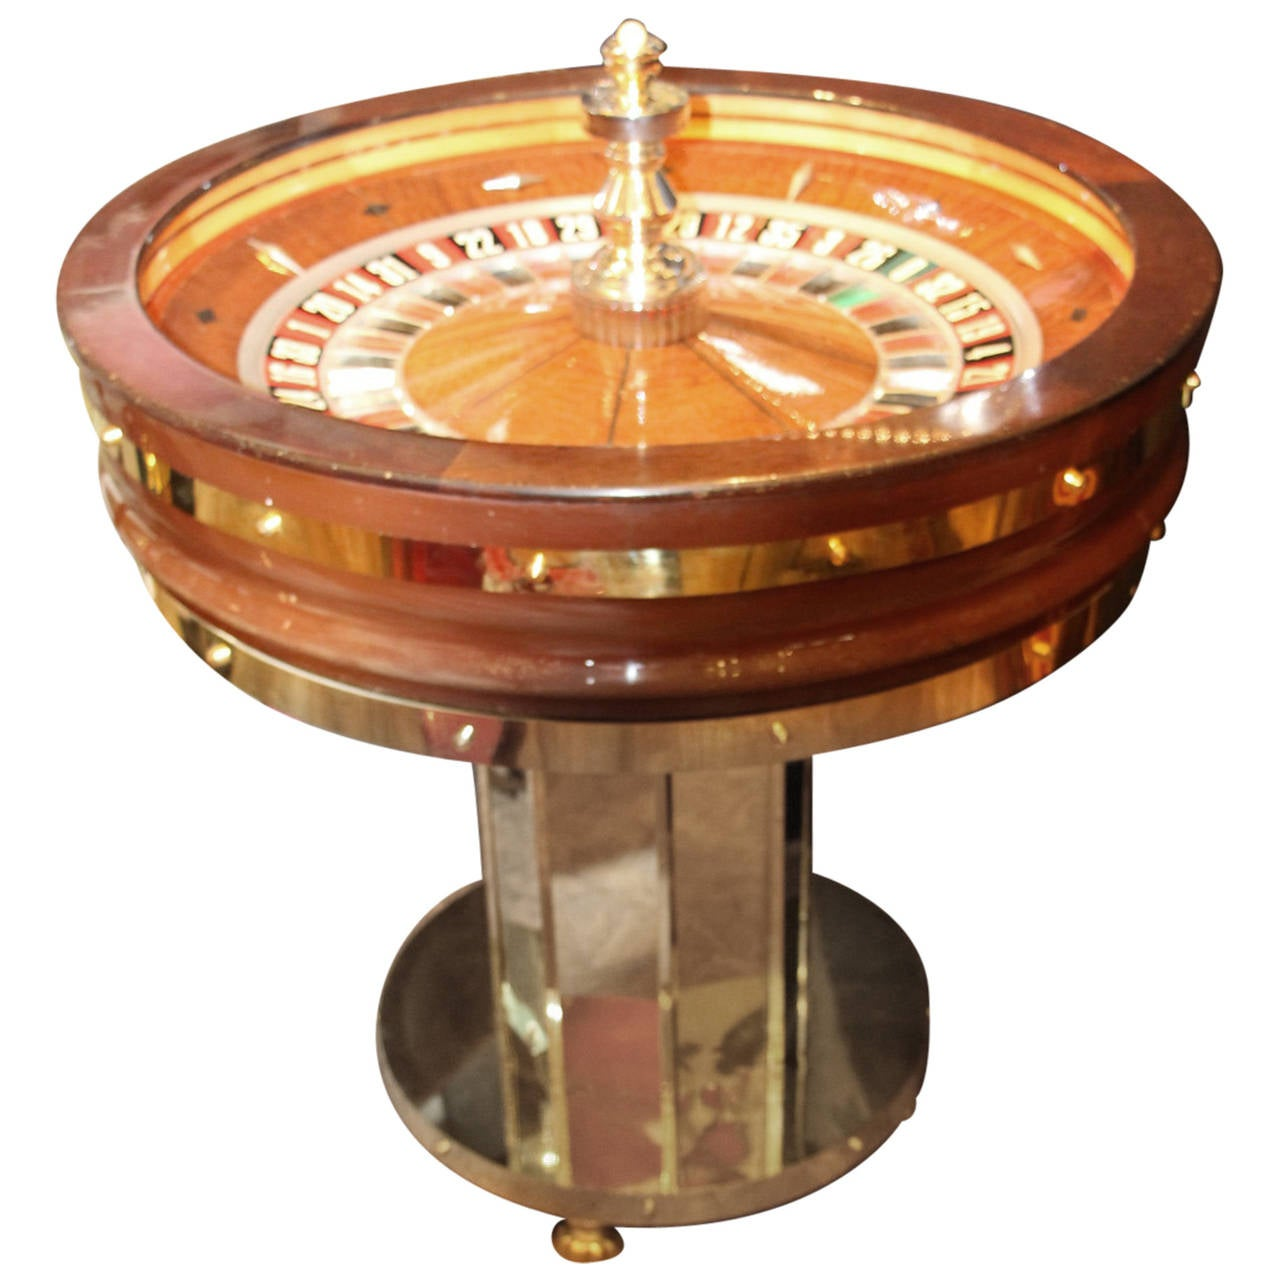 mahogany and amboina casino roulette wheel by john huxley. Black Bedroom Furniture Sets. Home Design Ideas